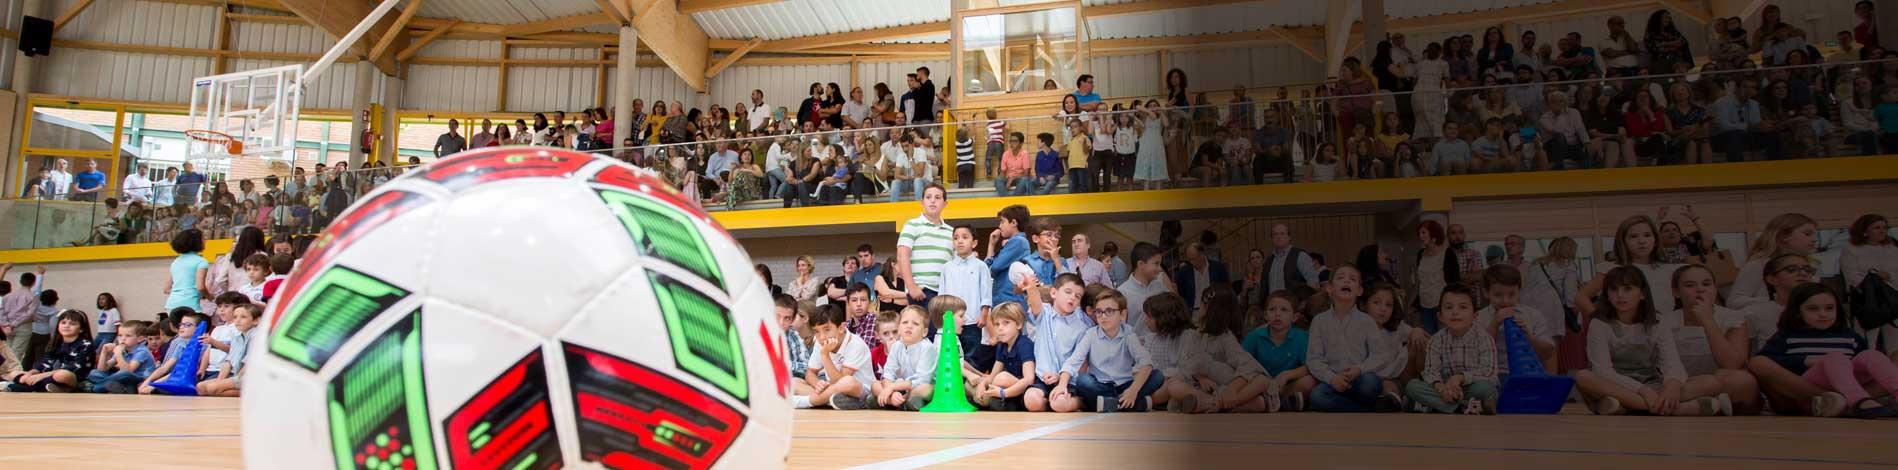 Polideportivo Diocesano Cardenal Cisneros